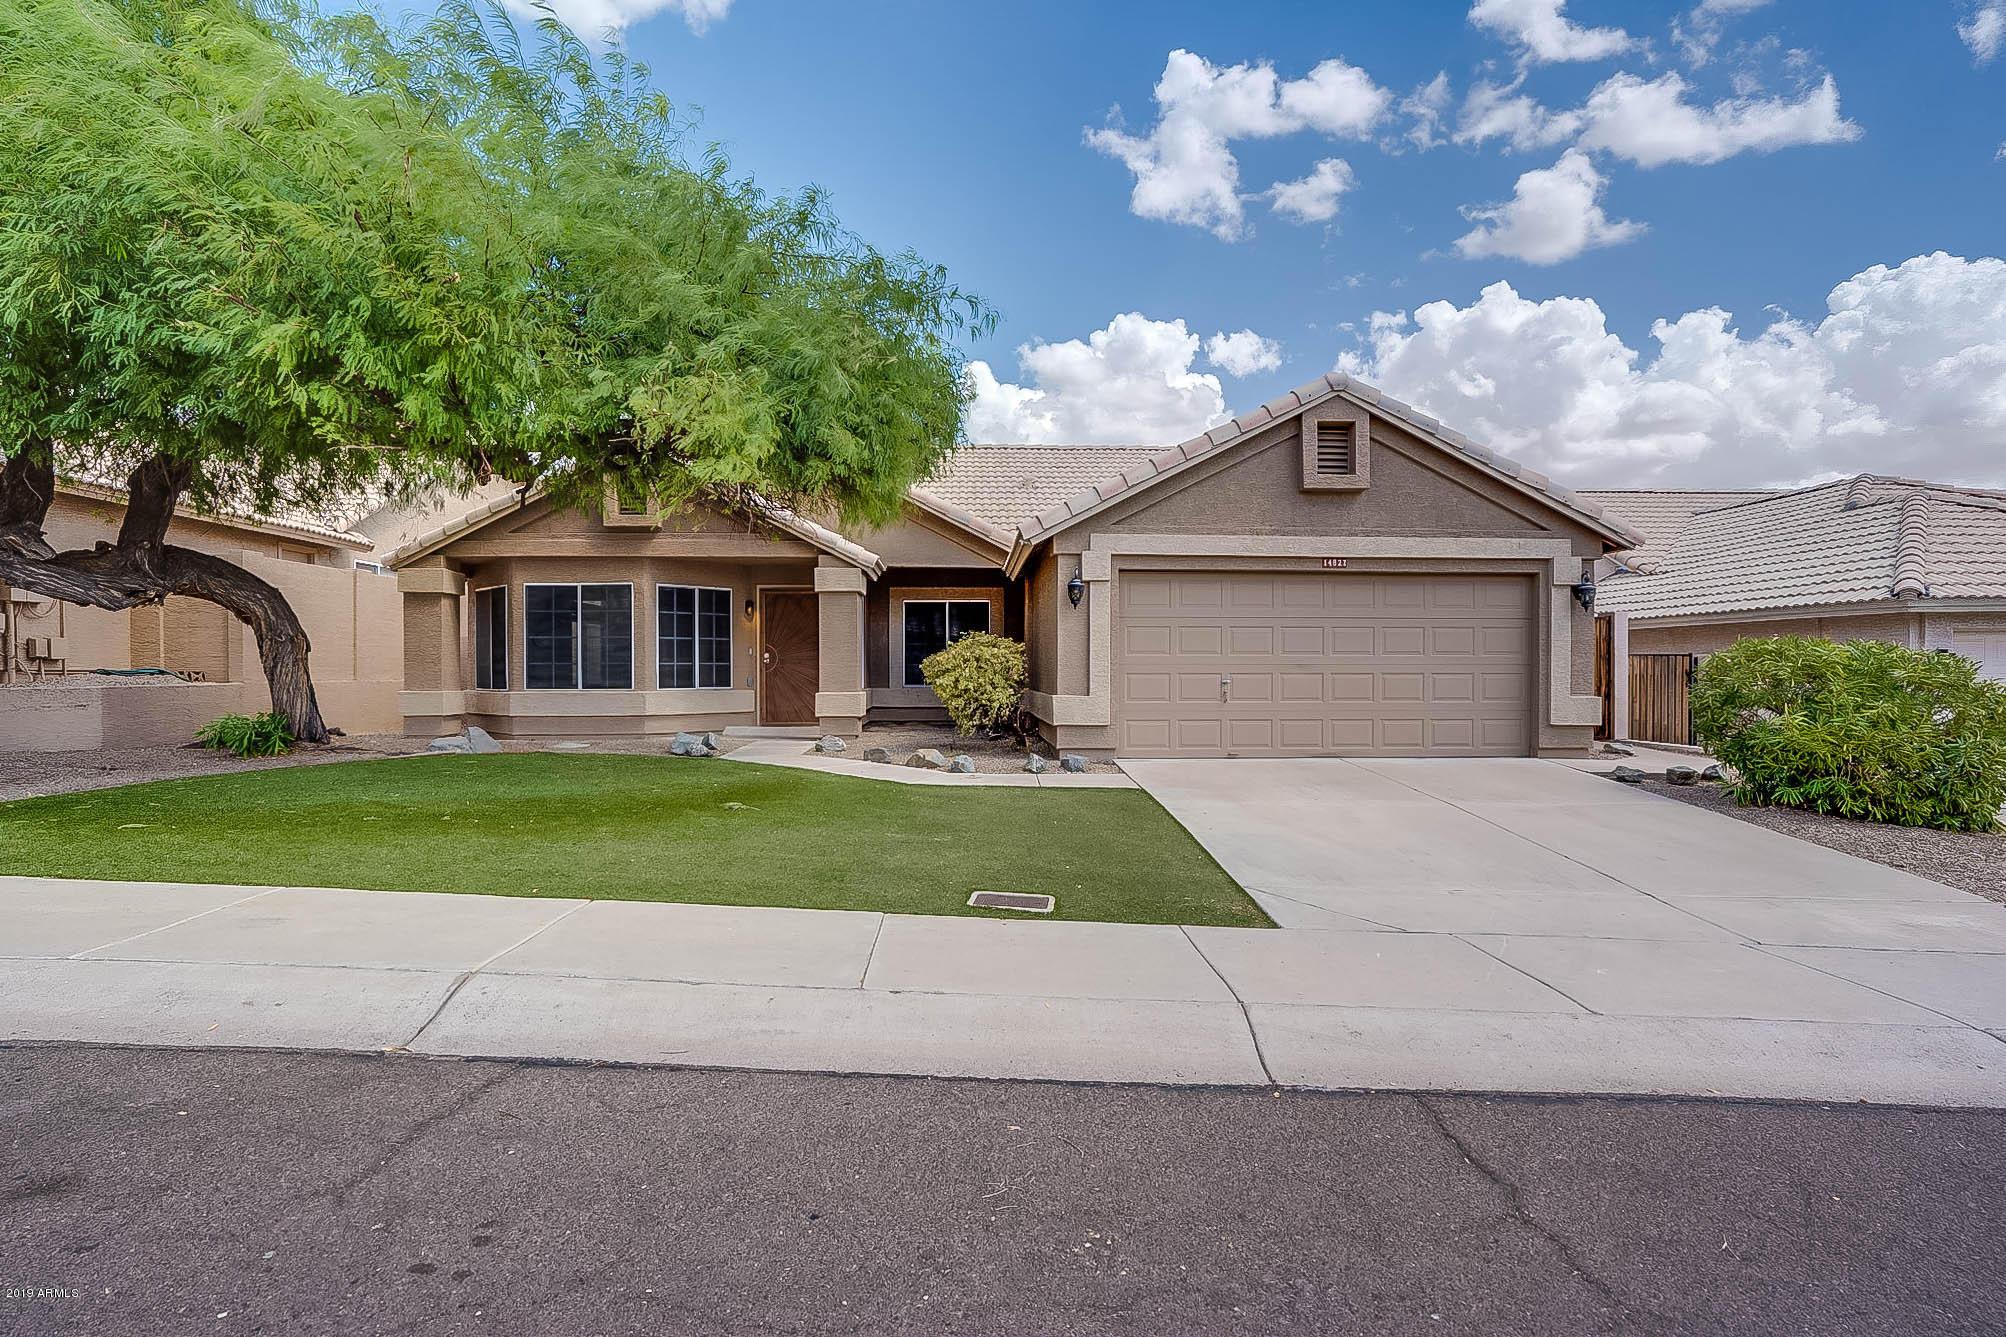 Photo of 14827 S 9TH Street, Phoenix, AZ 85048